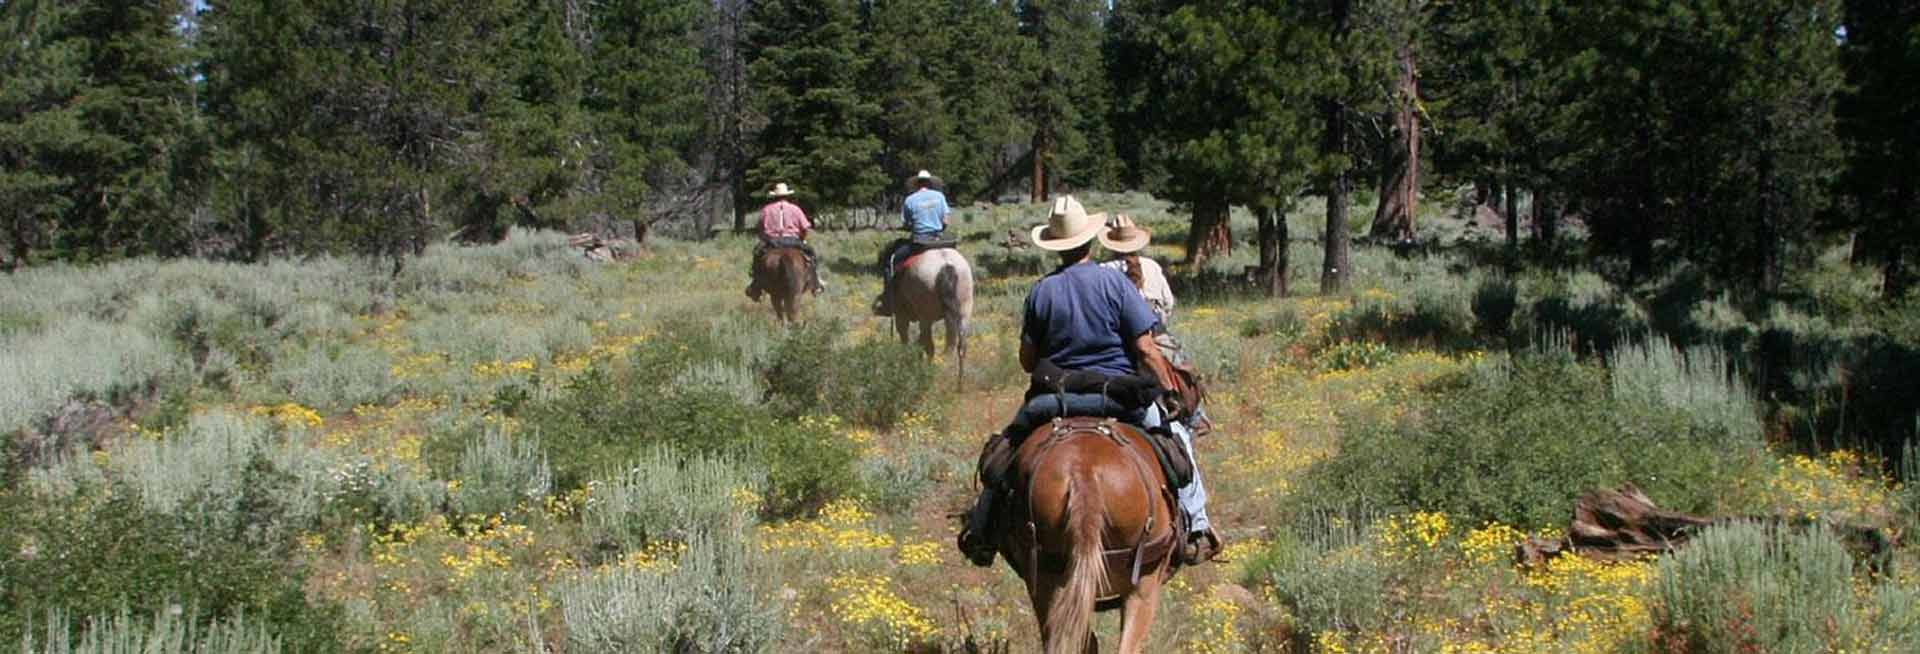 Group on horseback trail riding.